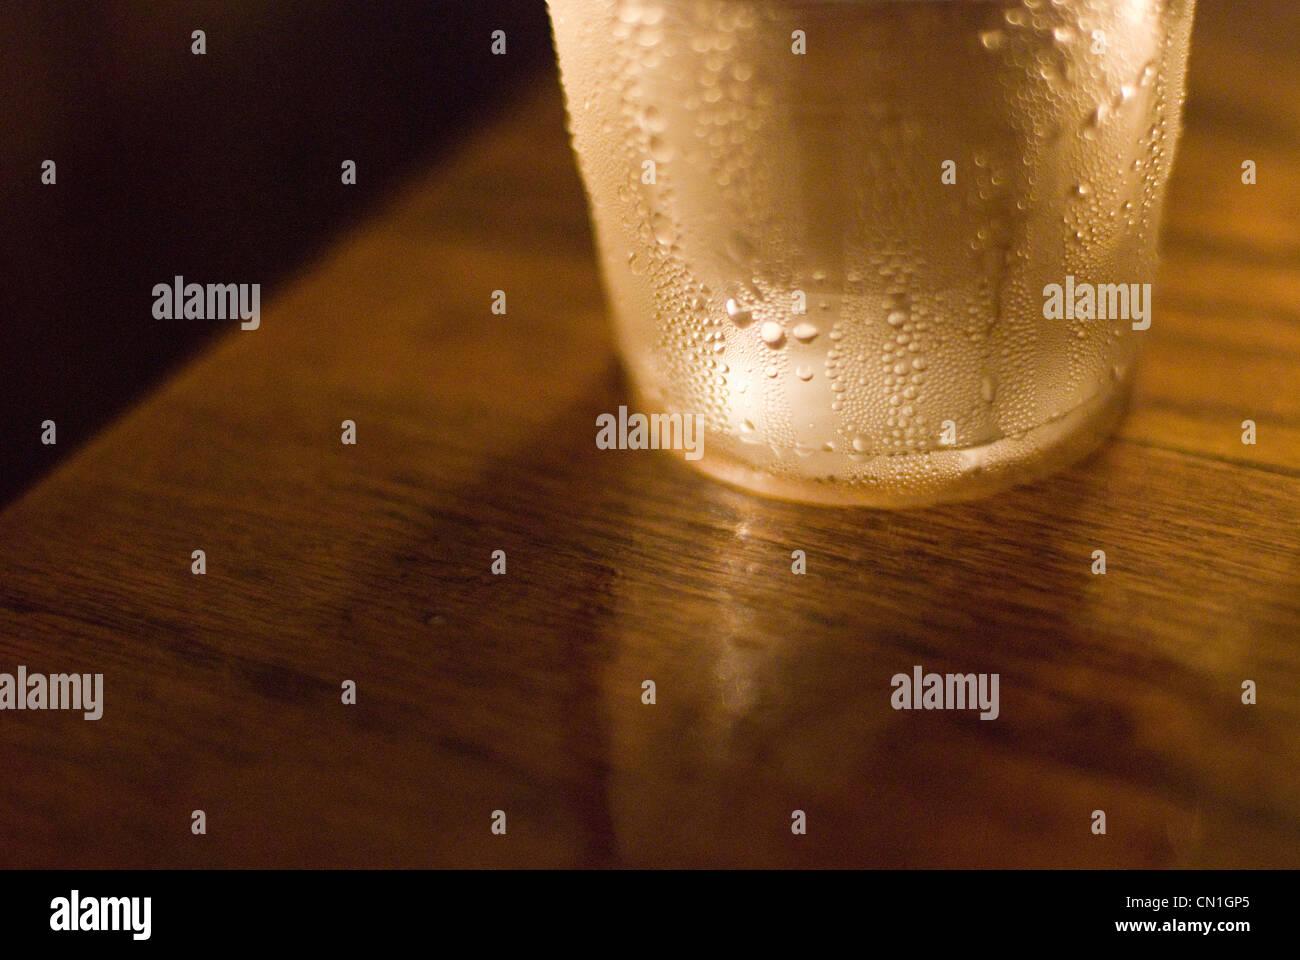 Kondensation auf Wasserglas Stockbild